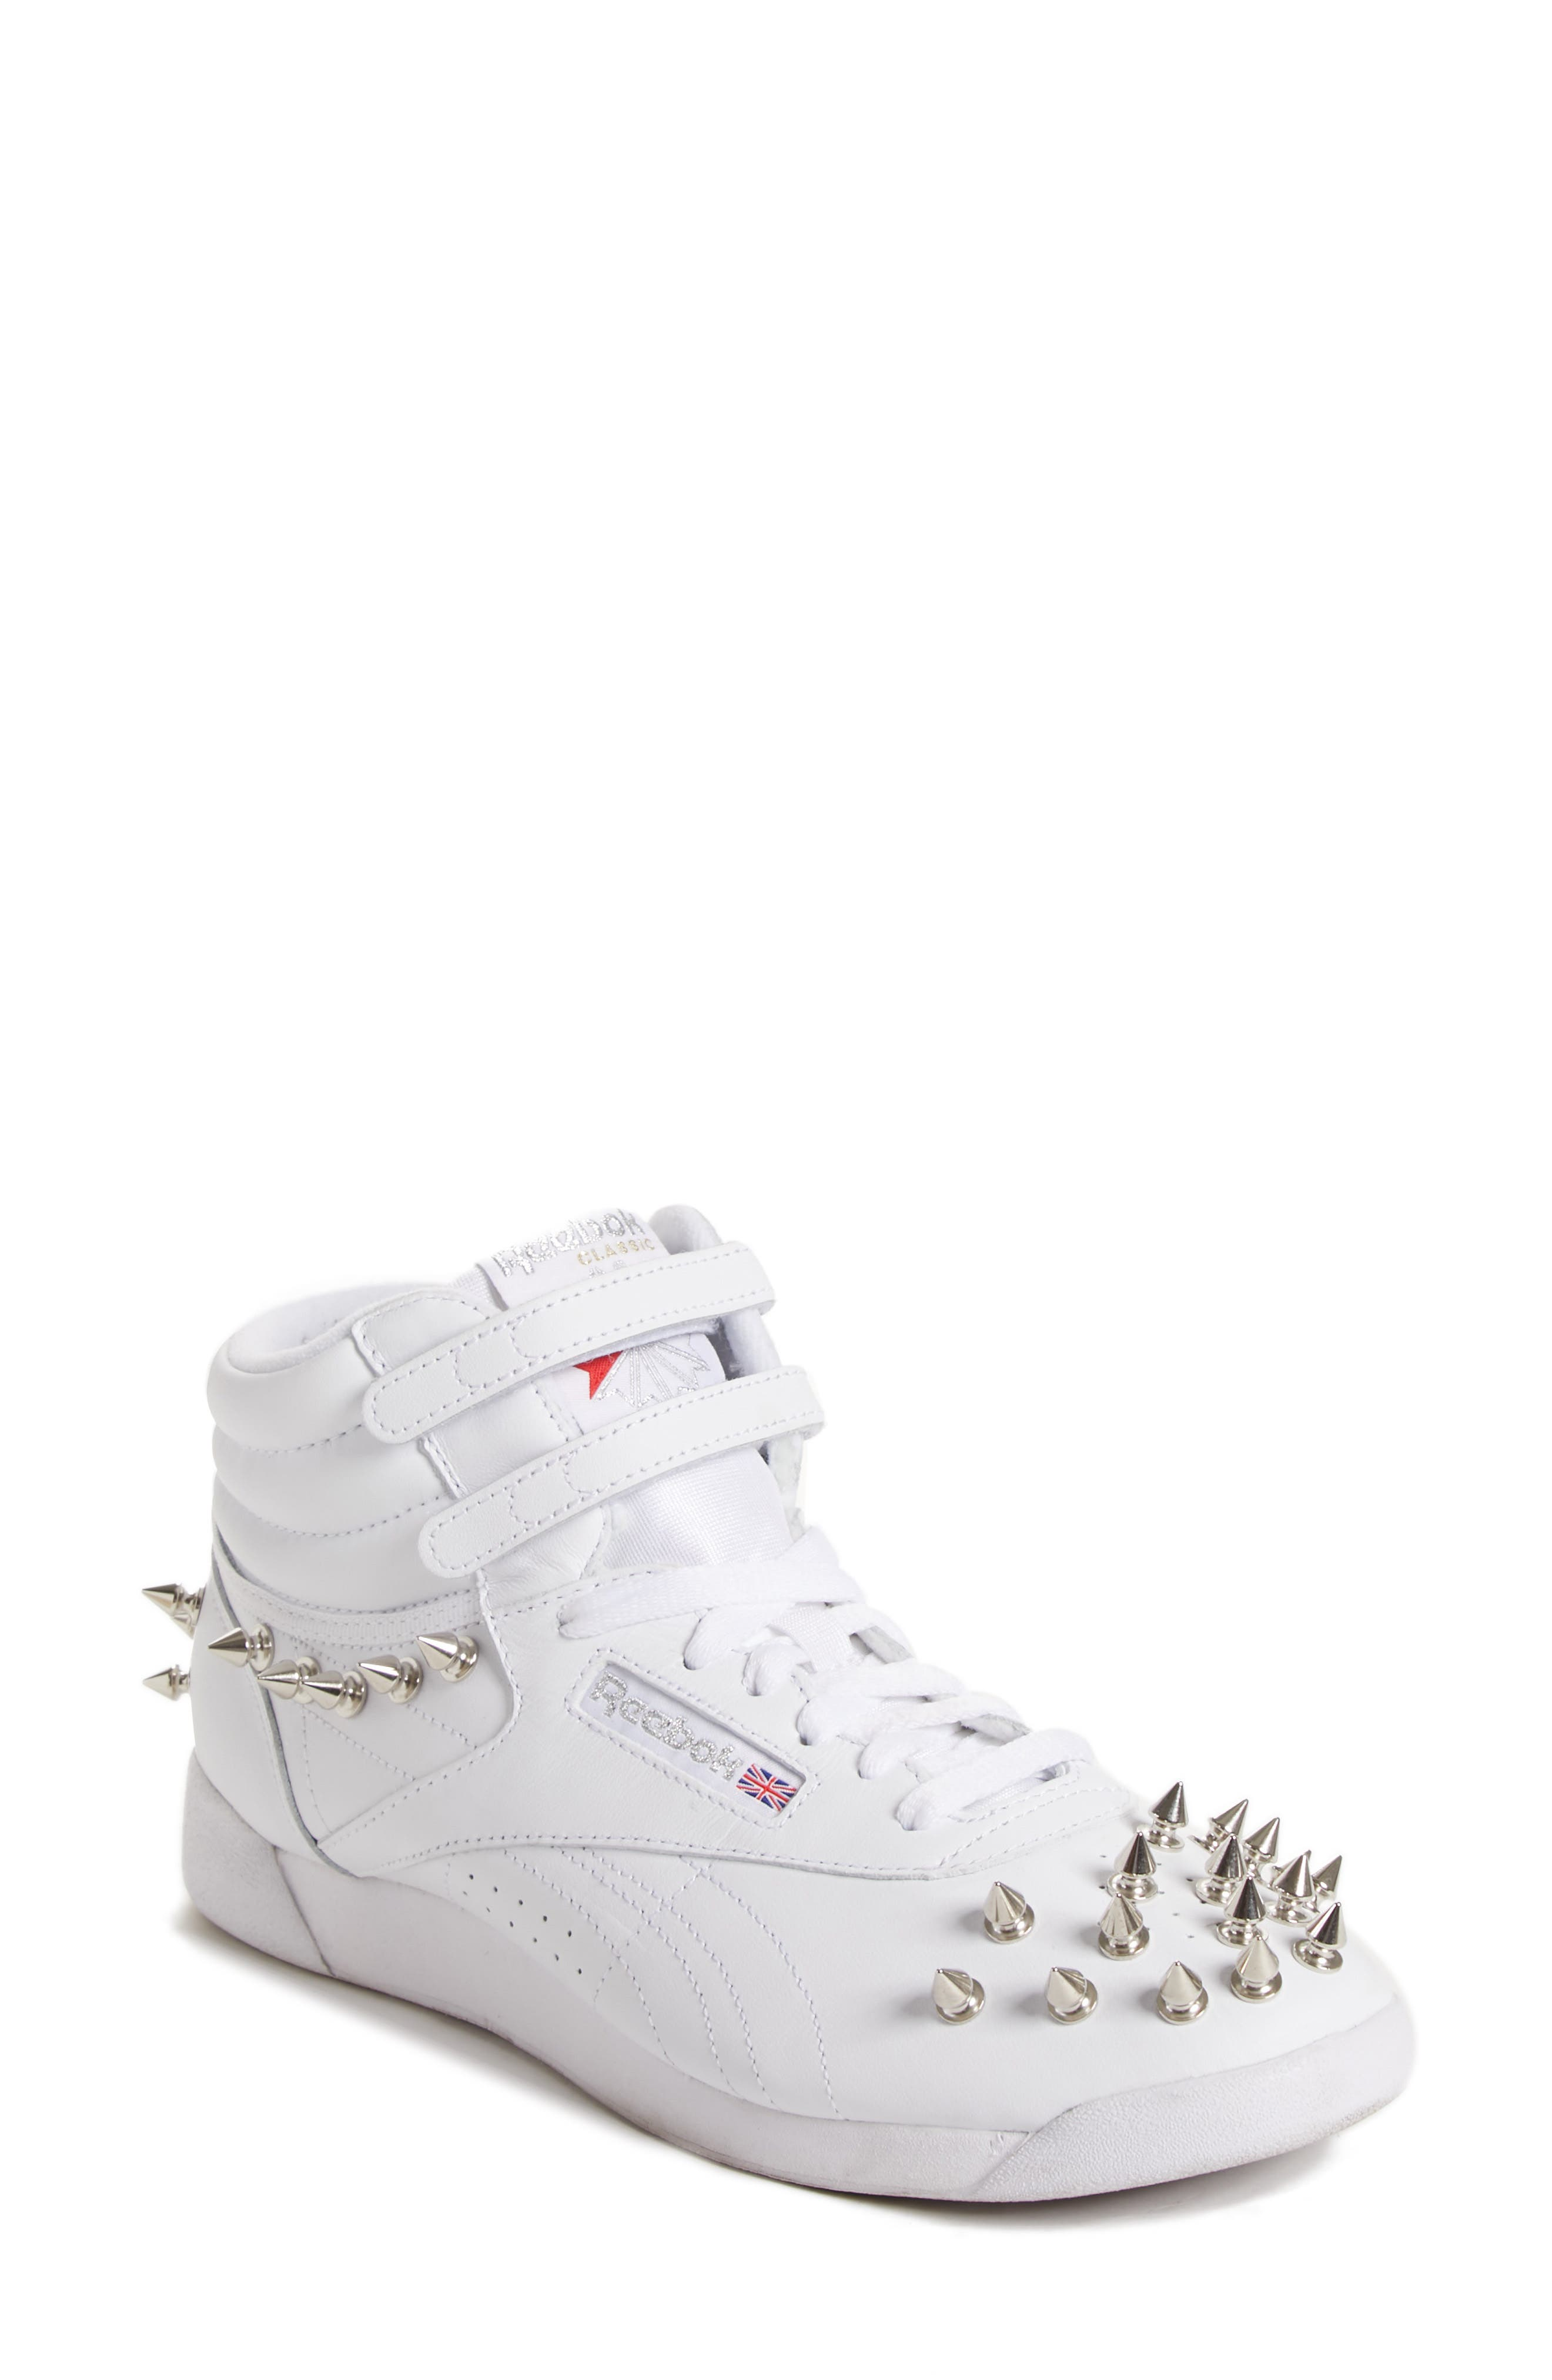 x Reebok Studded Sneaker,                             Main thumbnail 1, color,                             WHITE